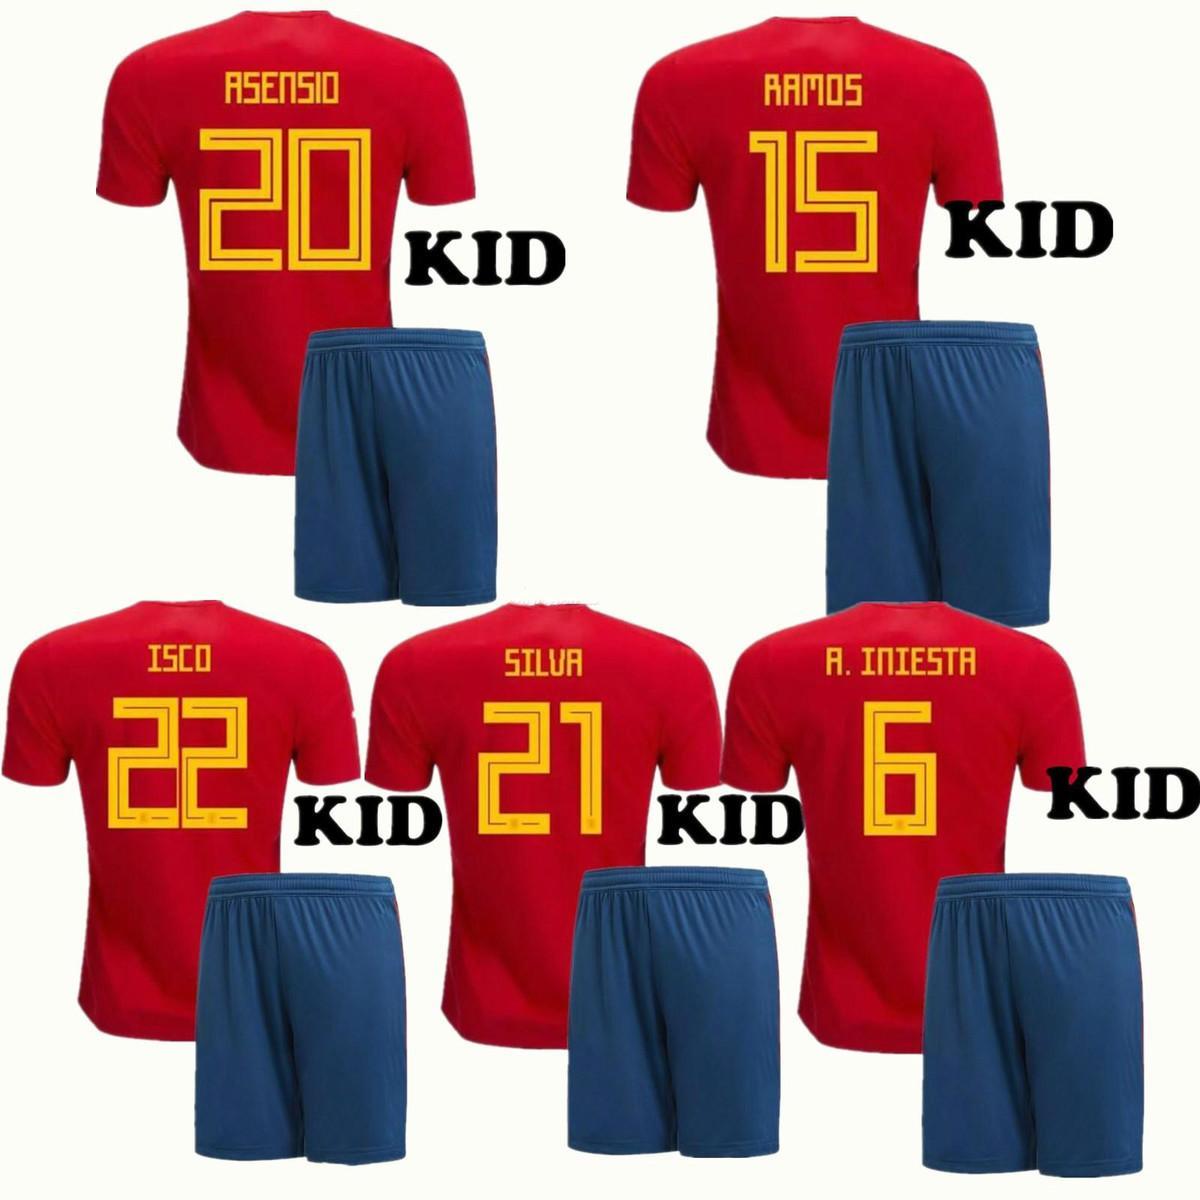 ce814d037 2014 world cup spain 10 fabregas home soccer shirt kit